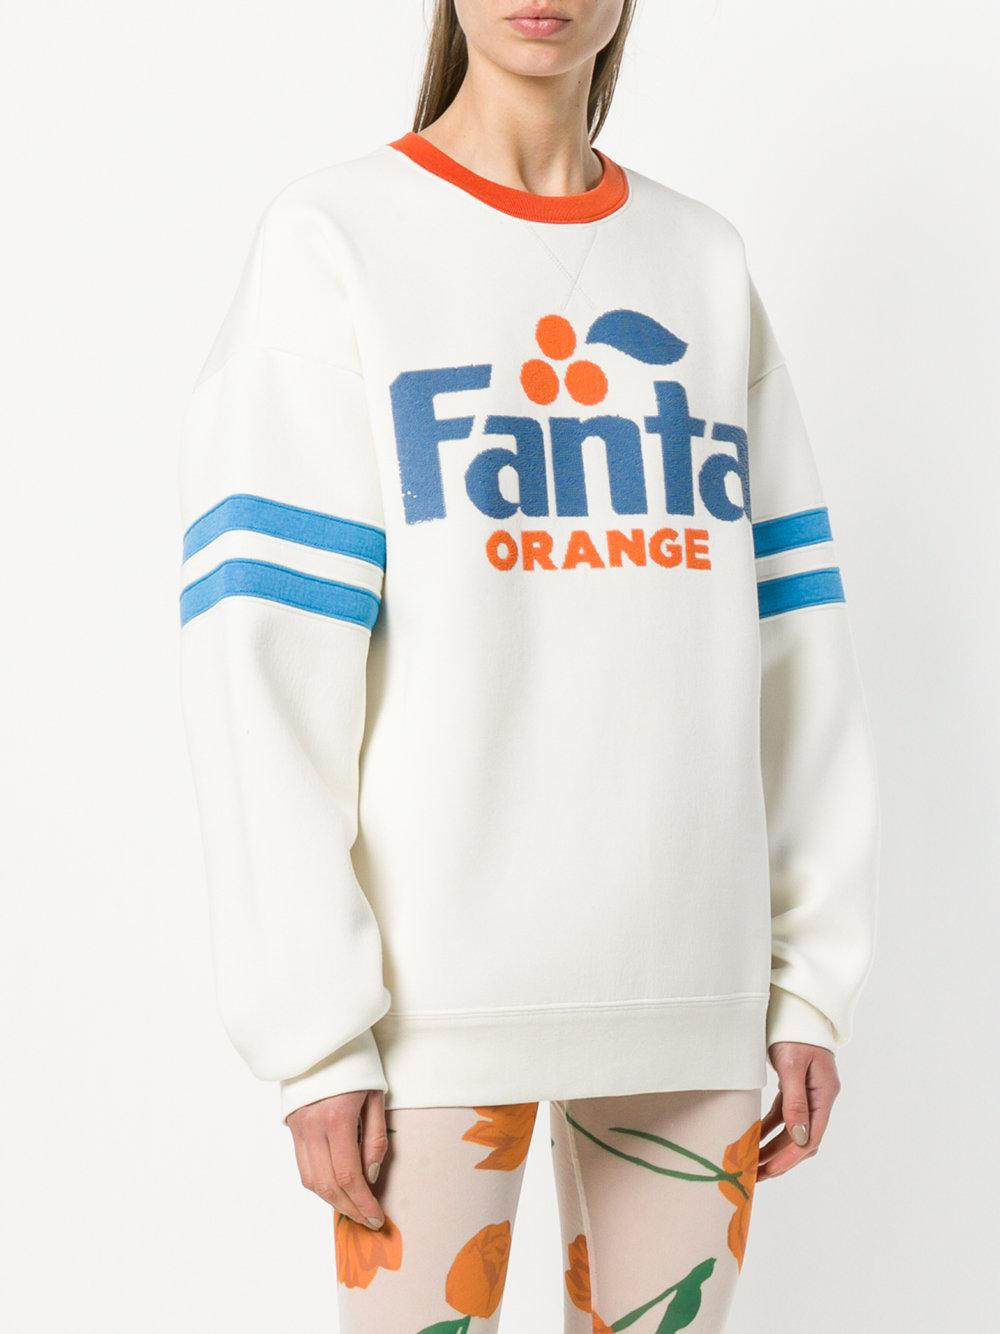 marc-jacobs-White-Fanta-Sweatshirt.jpeg